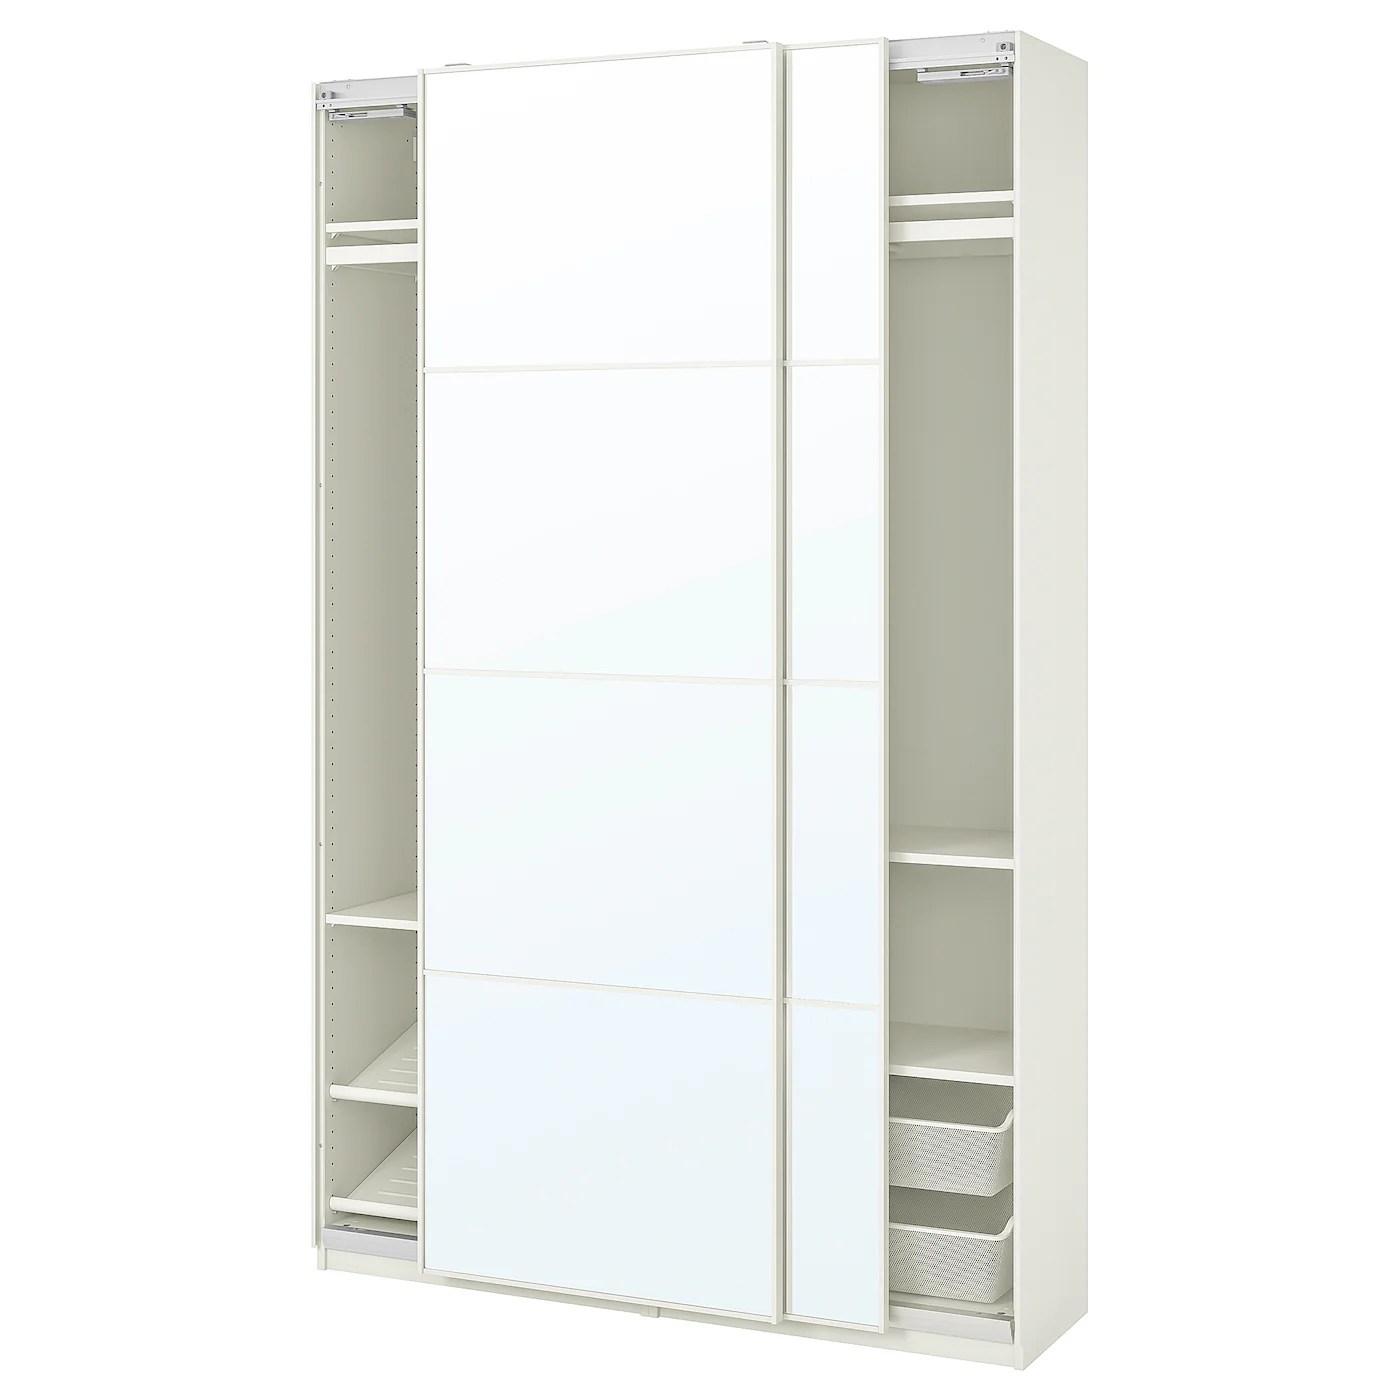 Pax Auli Combinaison Armoire Blanc Miroir 150x44x236 Cm Ikea